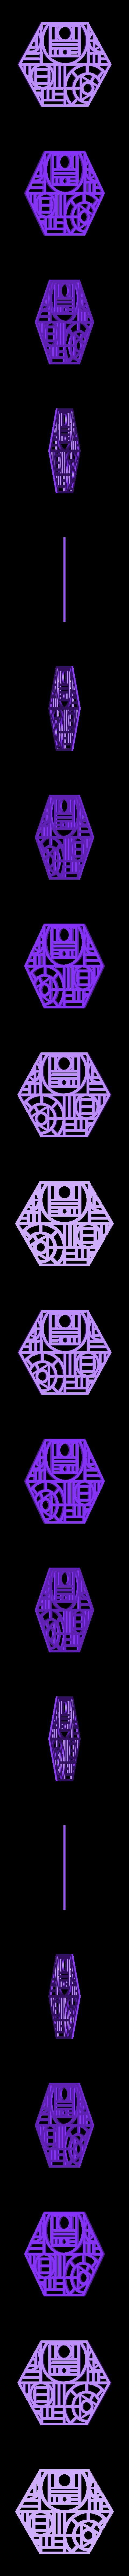 hexagon.stl Download free STL file Subdivided Surfaces • 3D printing design, ferjerez3d